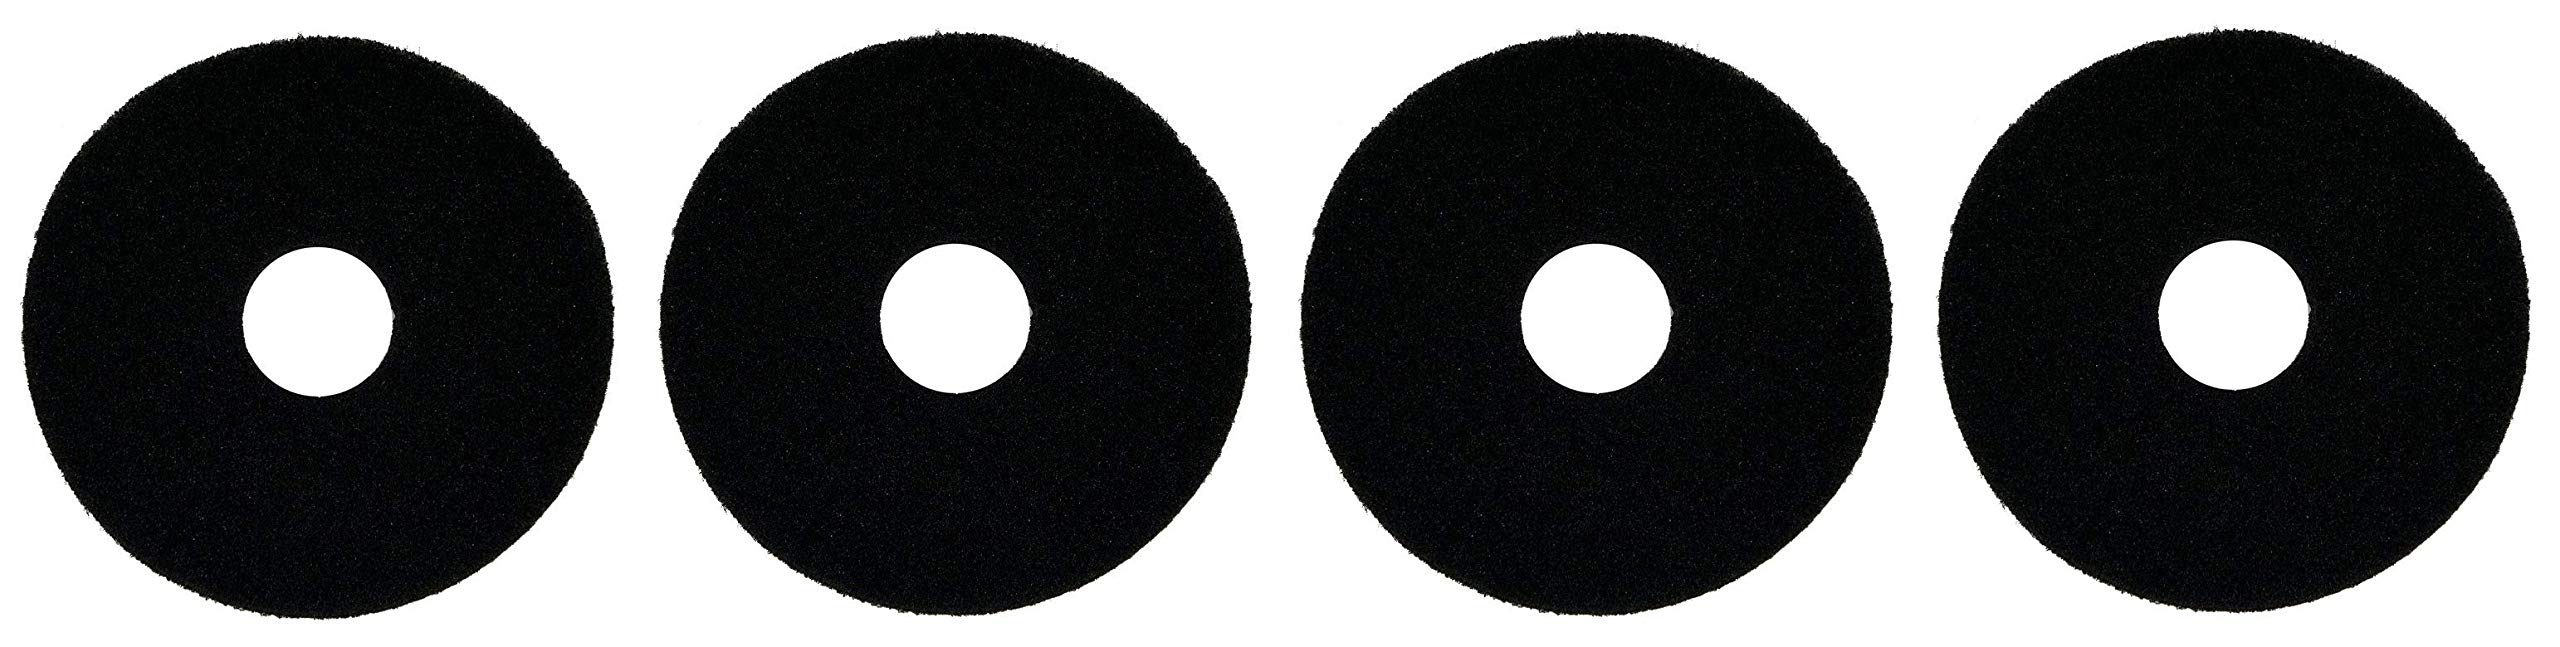 Oreck Commercial 437071 Strip Orbiter Pad, 12'' Diameter, Black, for ORB550MC Orbiter Floor Machine (Fоur Расk, Black)